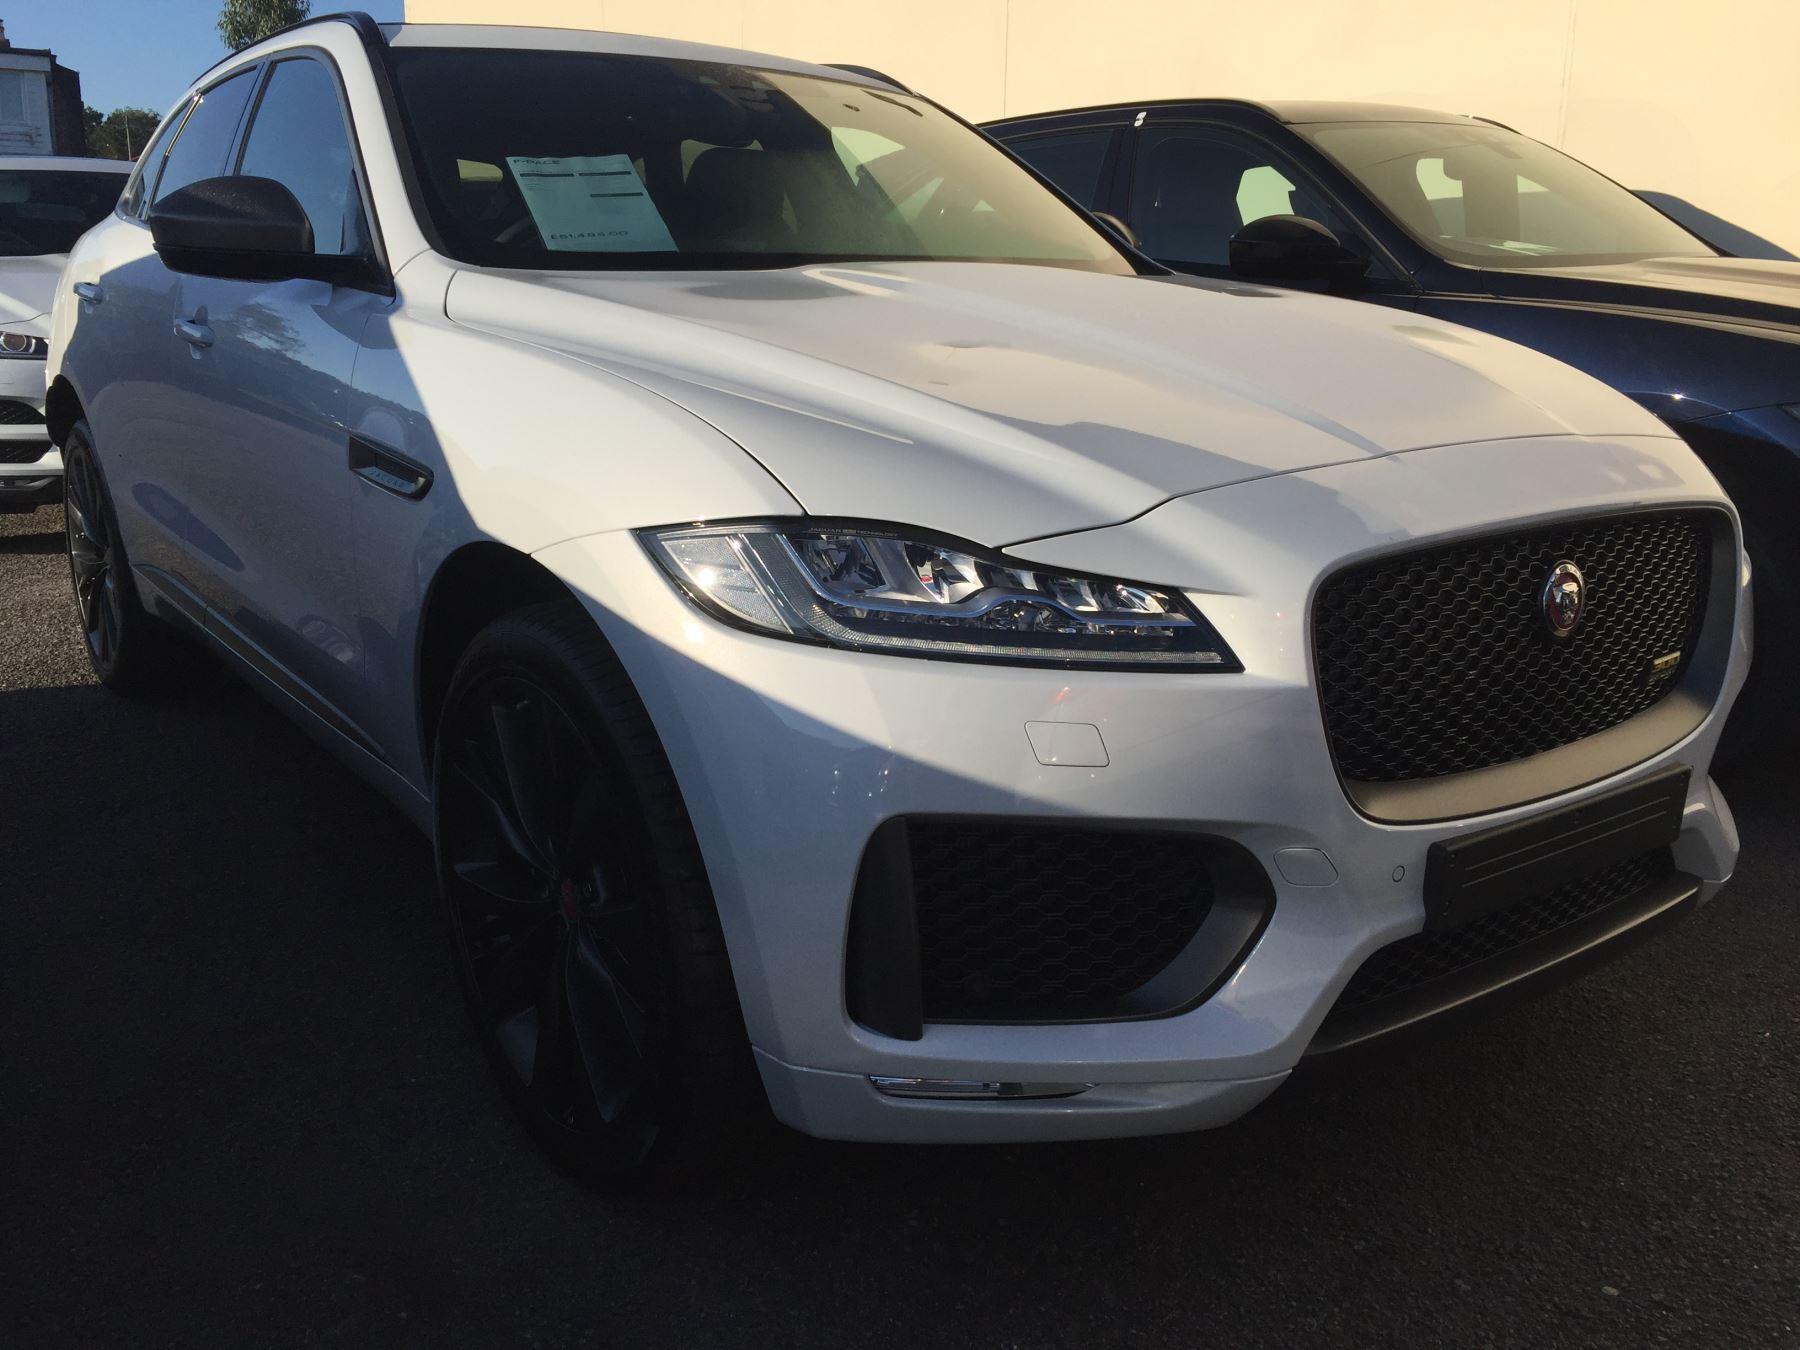 Jaguar F-PACE 2.0 300 Sport AWD SPECIAL EDITION 3,750 TOTAL DEPOSIT CONTRIBUTION Automatic 5 door Estate (2020)